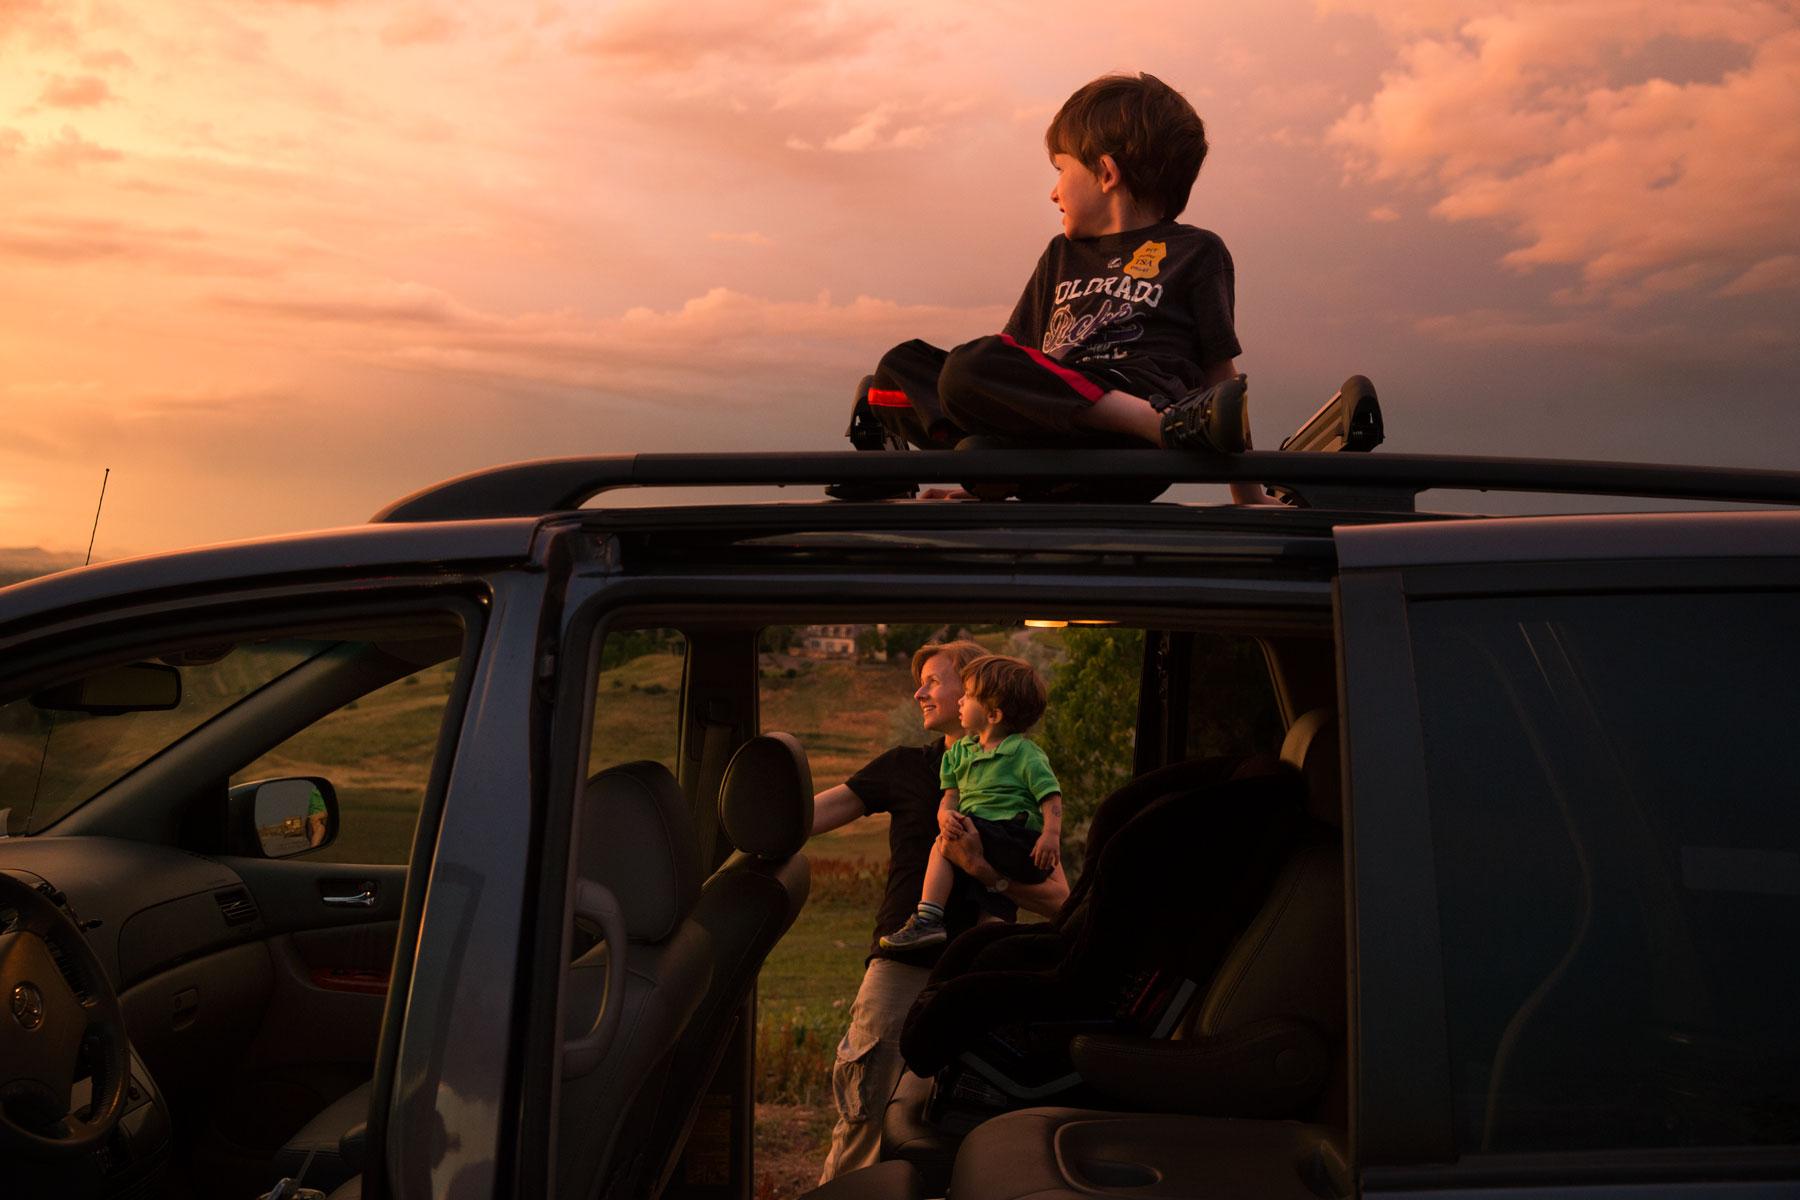 Family_Sunset_George_Lange_Lifestyle.jpg